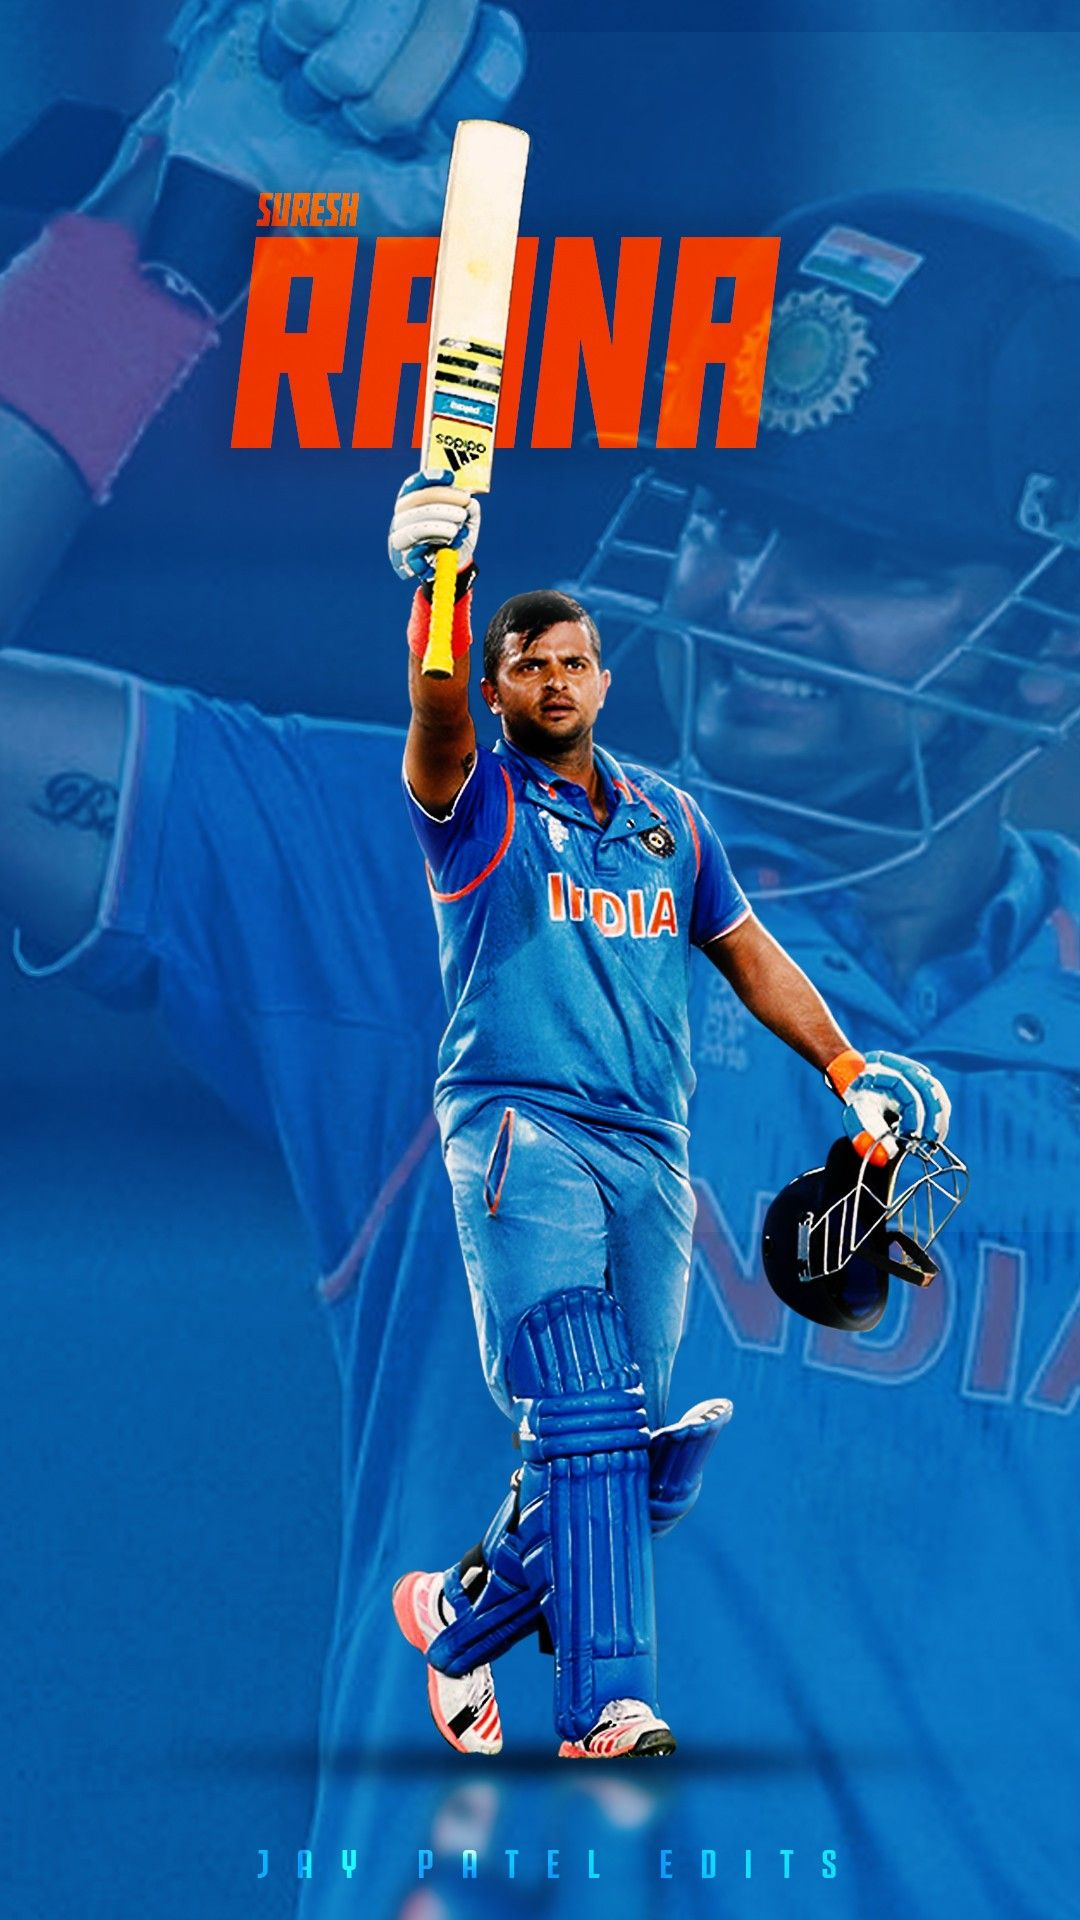 Suresh Raina Cricket Wallpapers Cricket Poster Dhoni Wallpapers